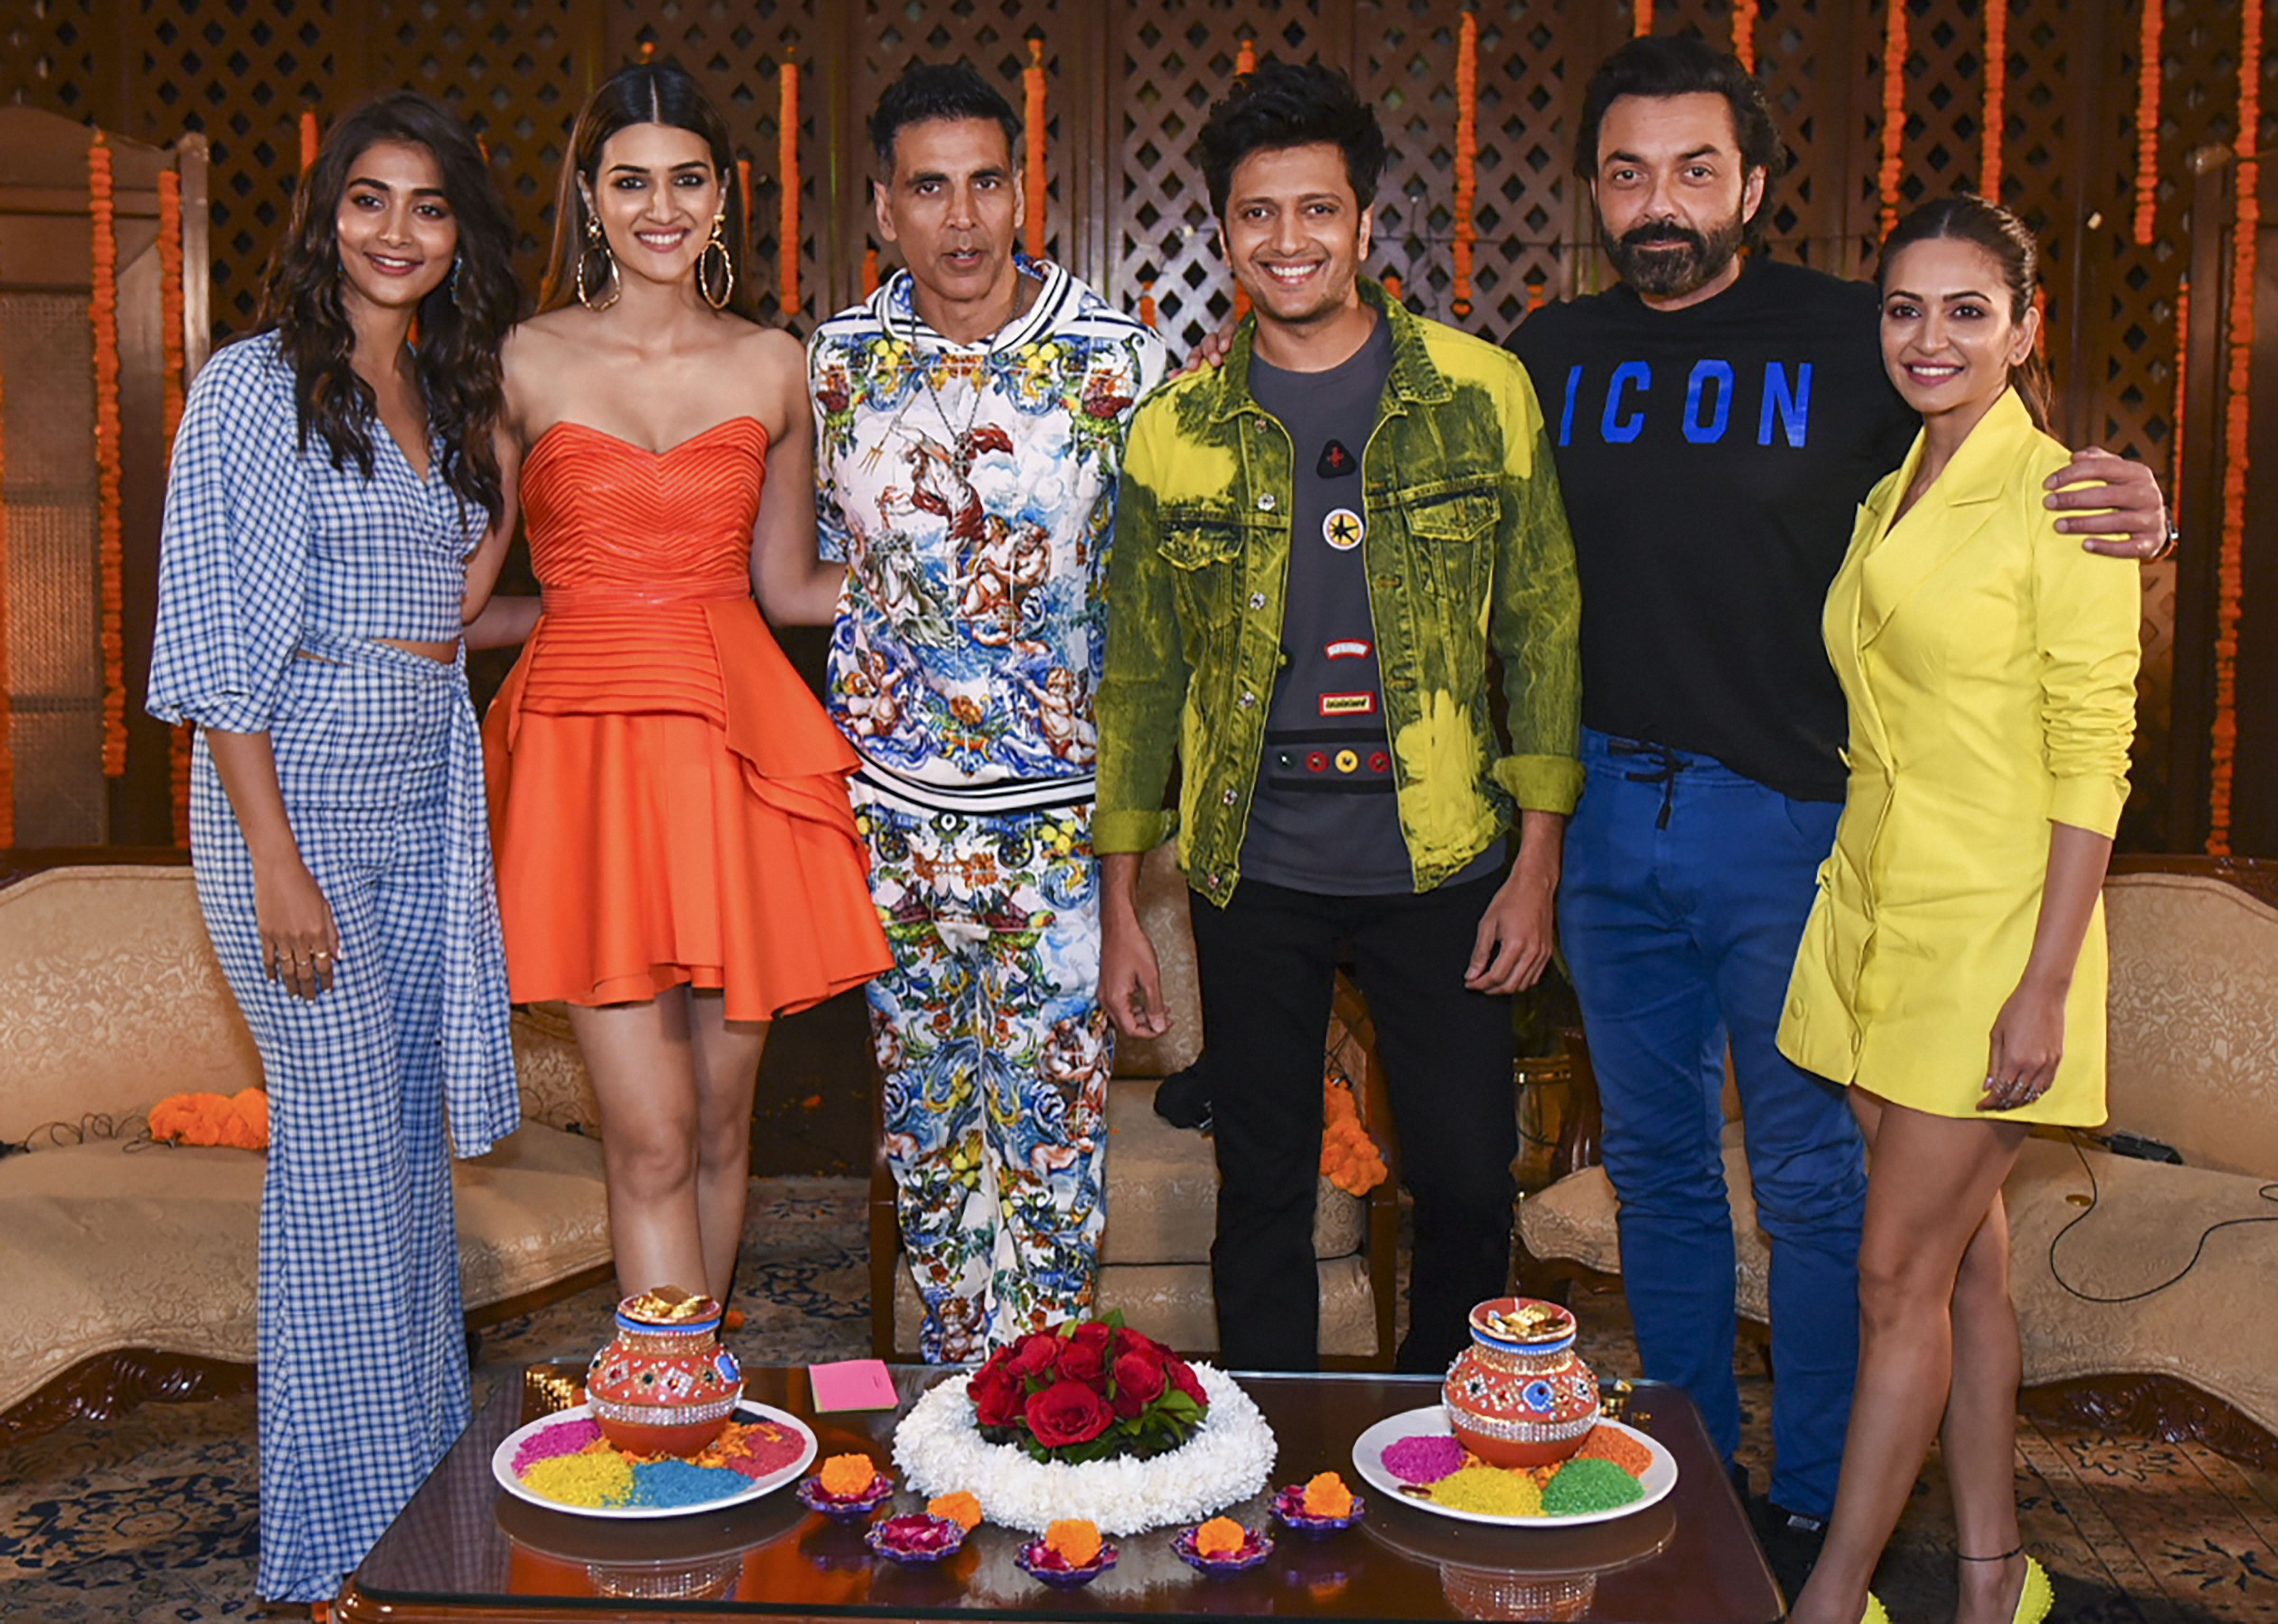 Bollywood actors Riteish Deshmukh, Kriti Sanon, Pooja Hegde, Bobby Deol, Akshay Kumar and Kriti Kharbanda pose during the promotion of their film 'Housefull 4', in New Delhi, Friday, October 18, 2019